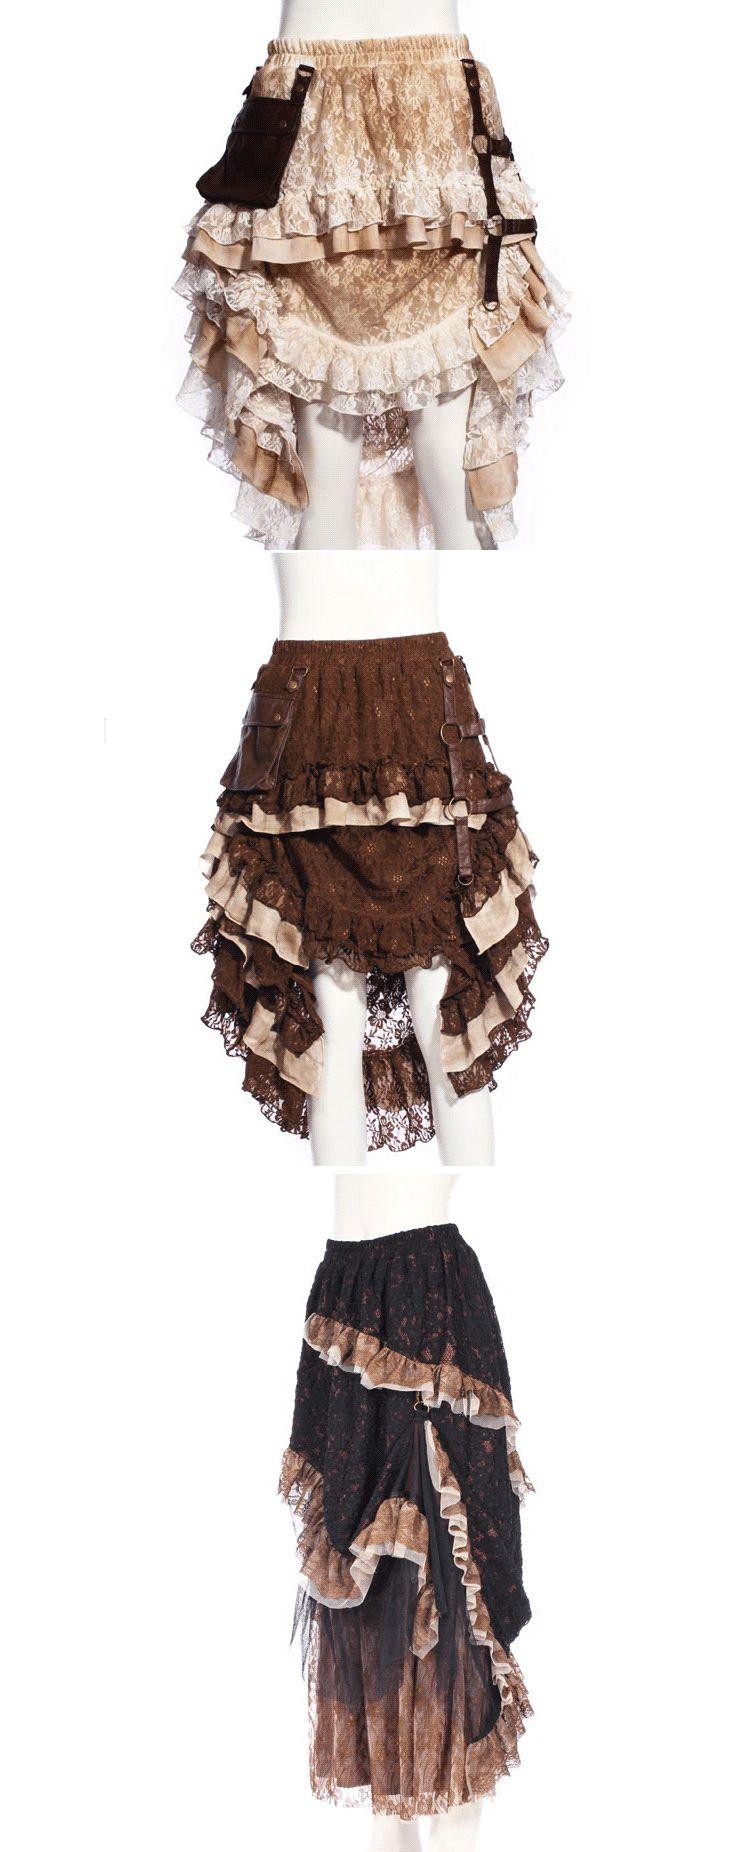 Shop steampunk Victorian skirts at RebelsMarket.